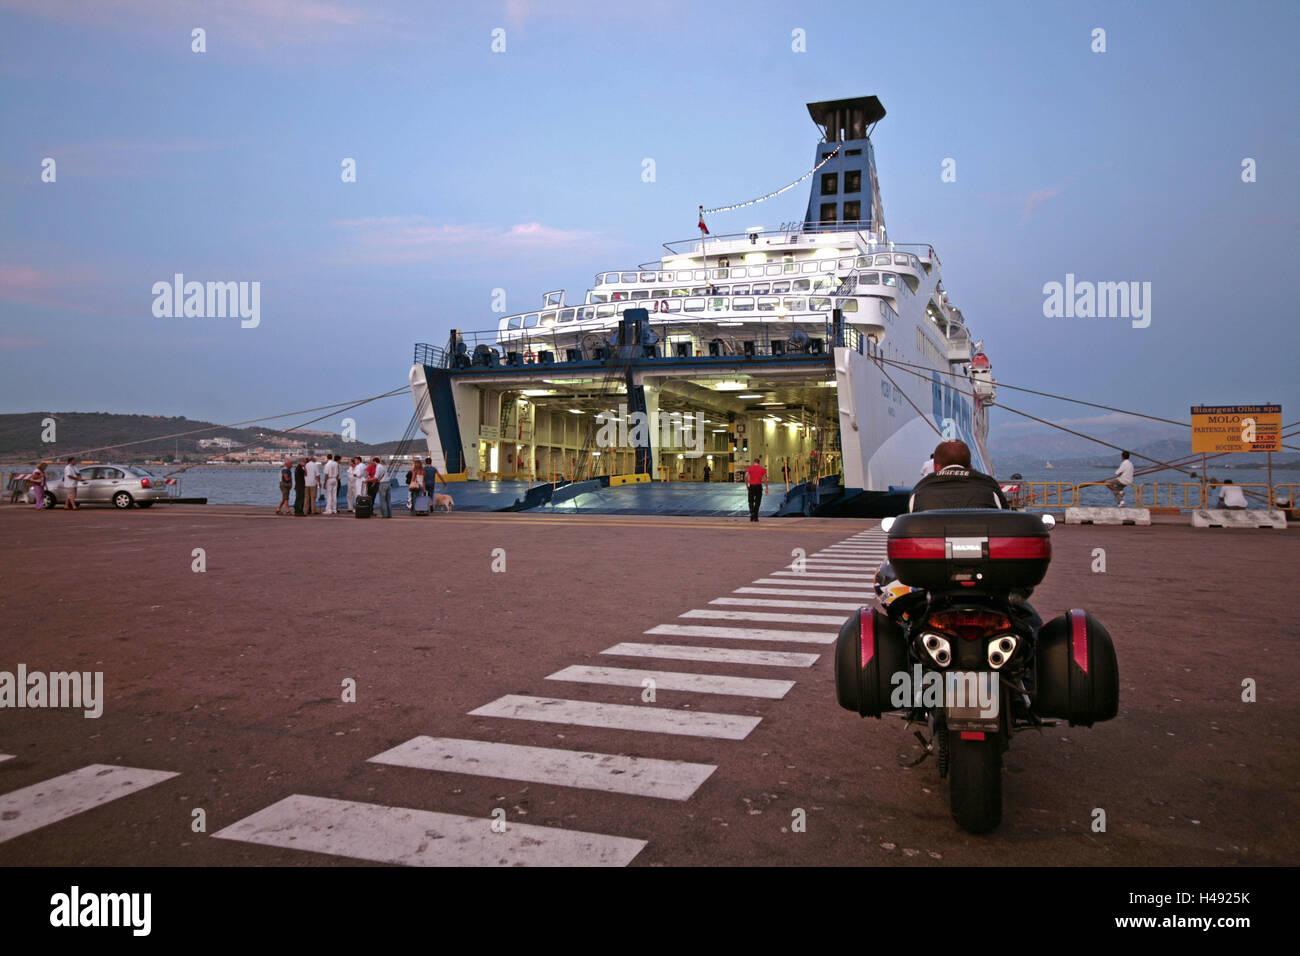 Italy, Sardinia, Olbia, harbour, ferry, dusk, Europe, island, destination, tourism, navigation, ship, landing stage, - Stock Image